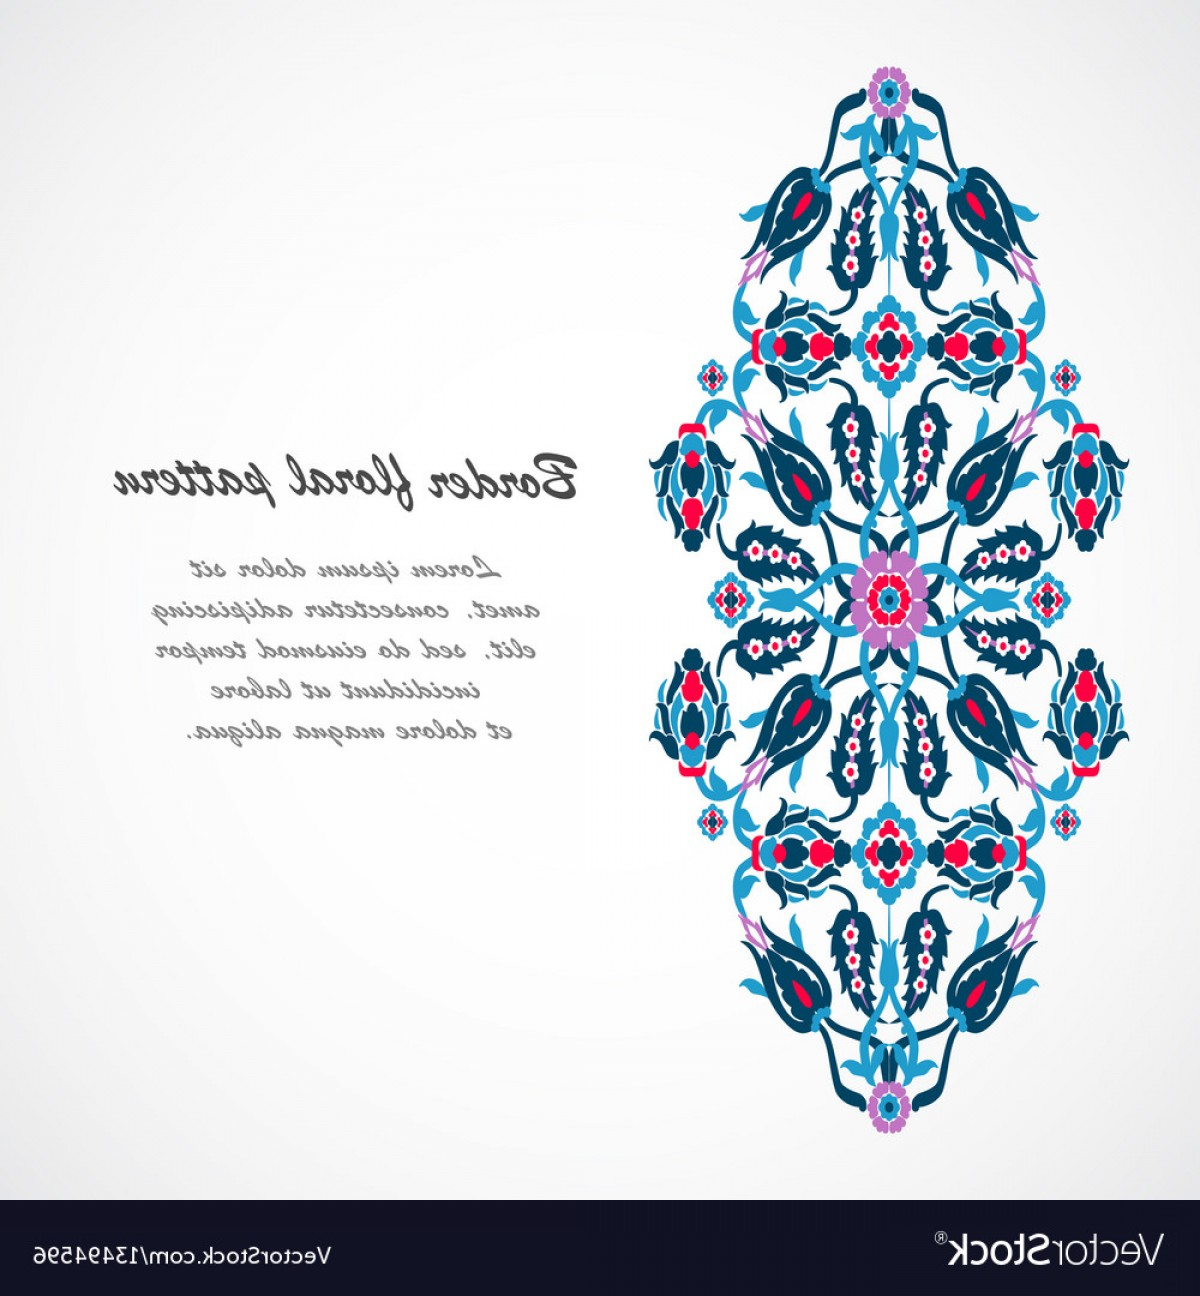 1200x1296 Arabesque Vintage Ornate Border For Design Vector Orangiausa